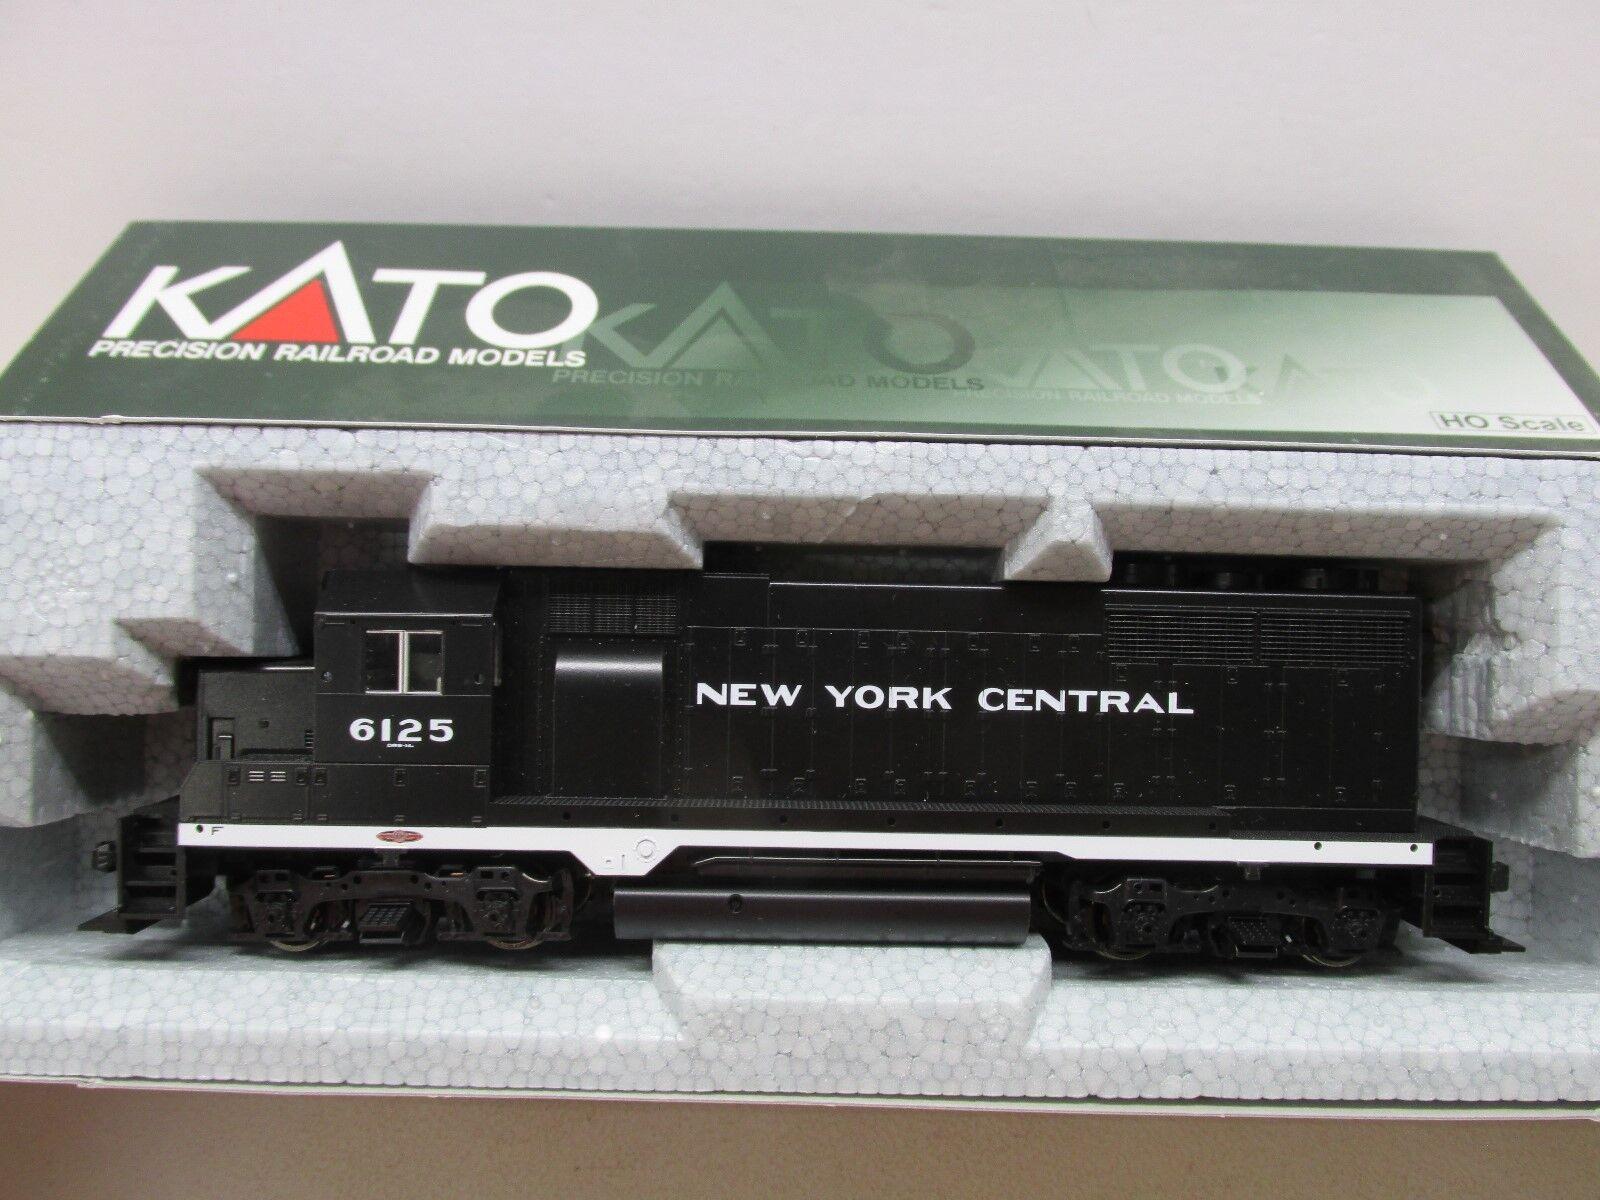 KATO  NEW YORK CENTRAL GP35 POWERED LOCOMOTIVE HO SCALE